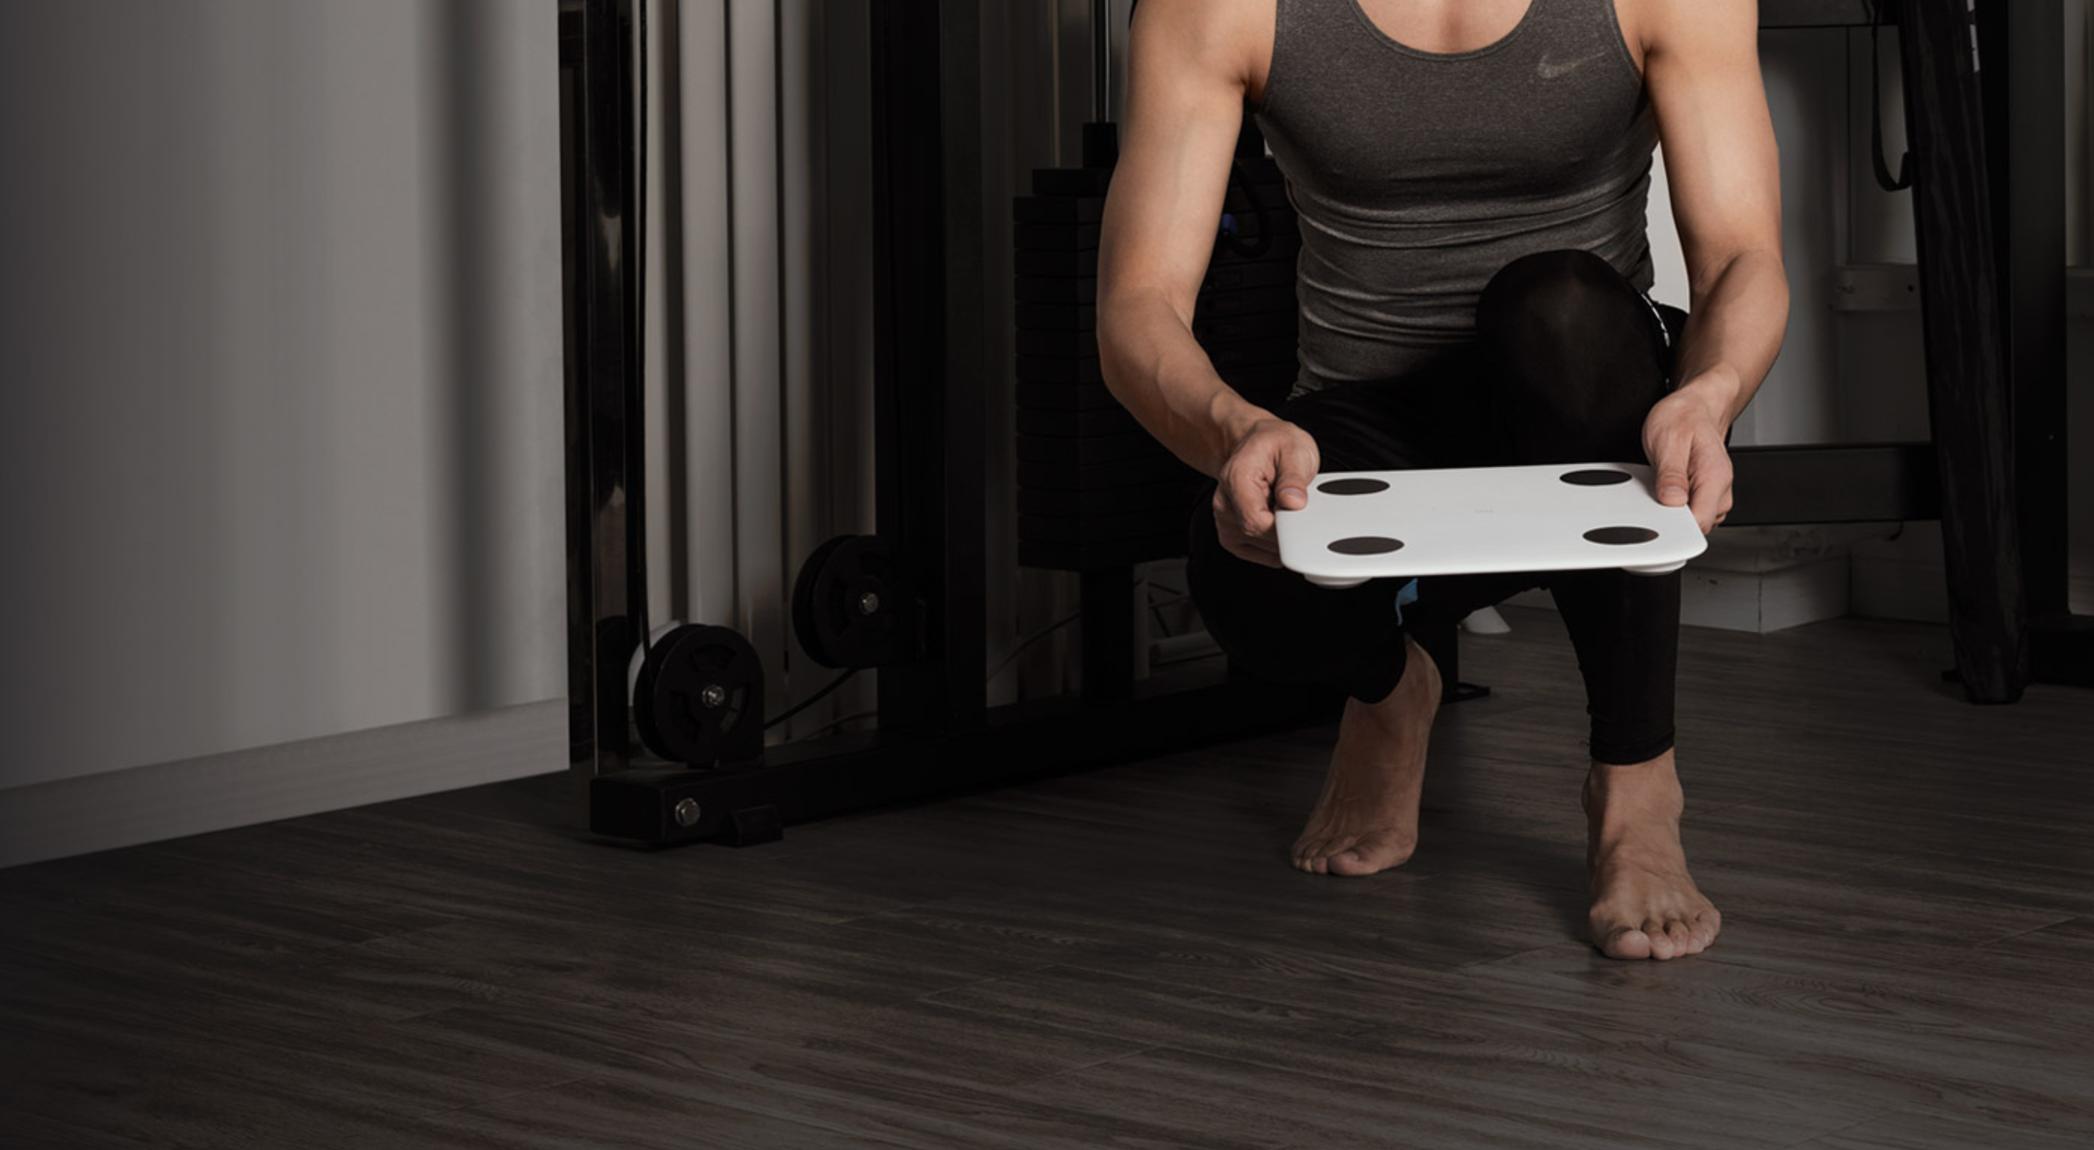 Xiaomi mi scale 2: изучаем обновленные весы